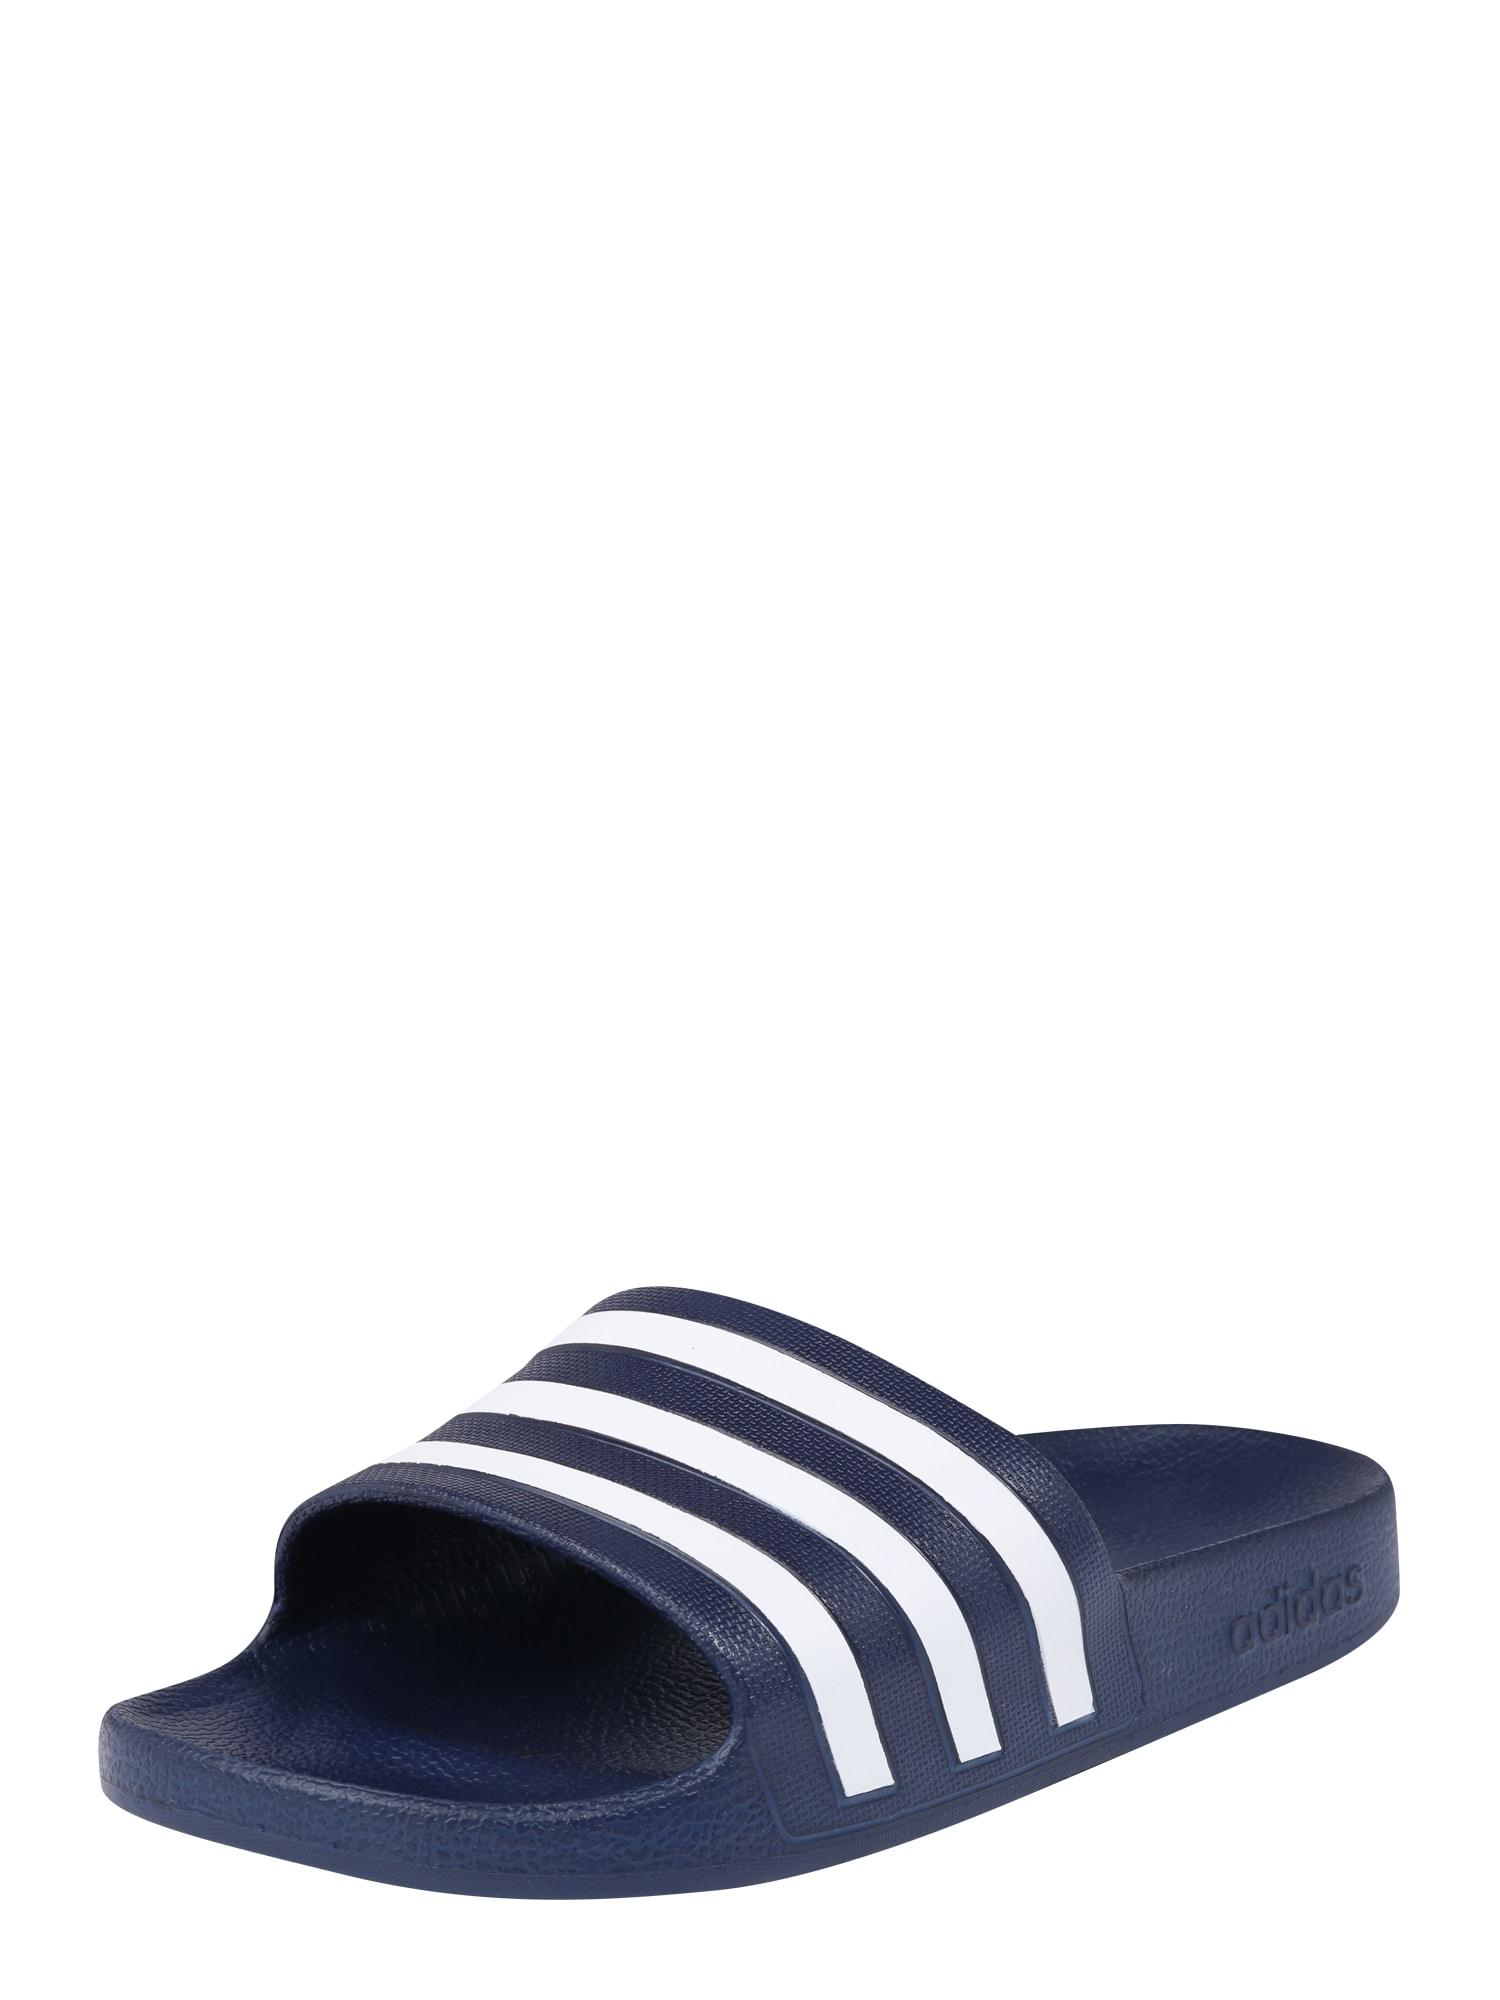 ADIDAS PERFORMANCE Sandalai / maudymosi batai 'Adilette Aqua' balta / tamsiai mėlyna